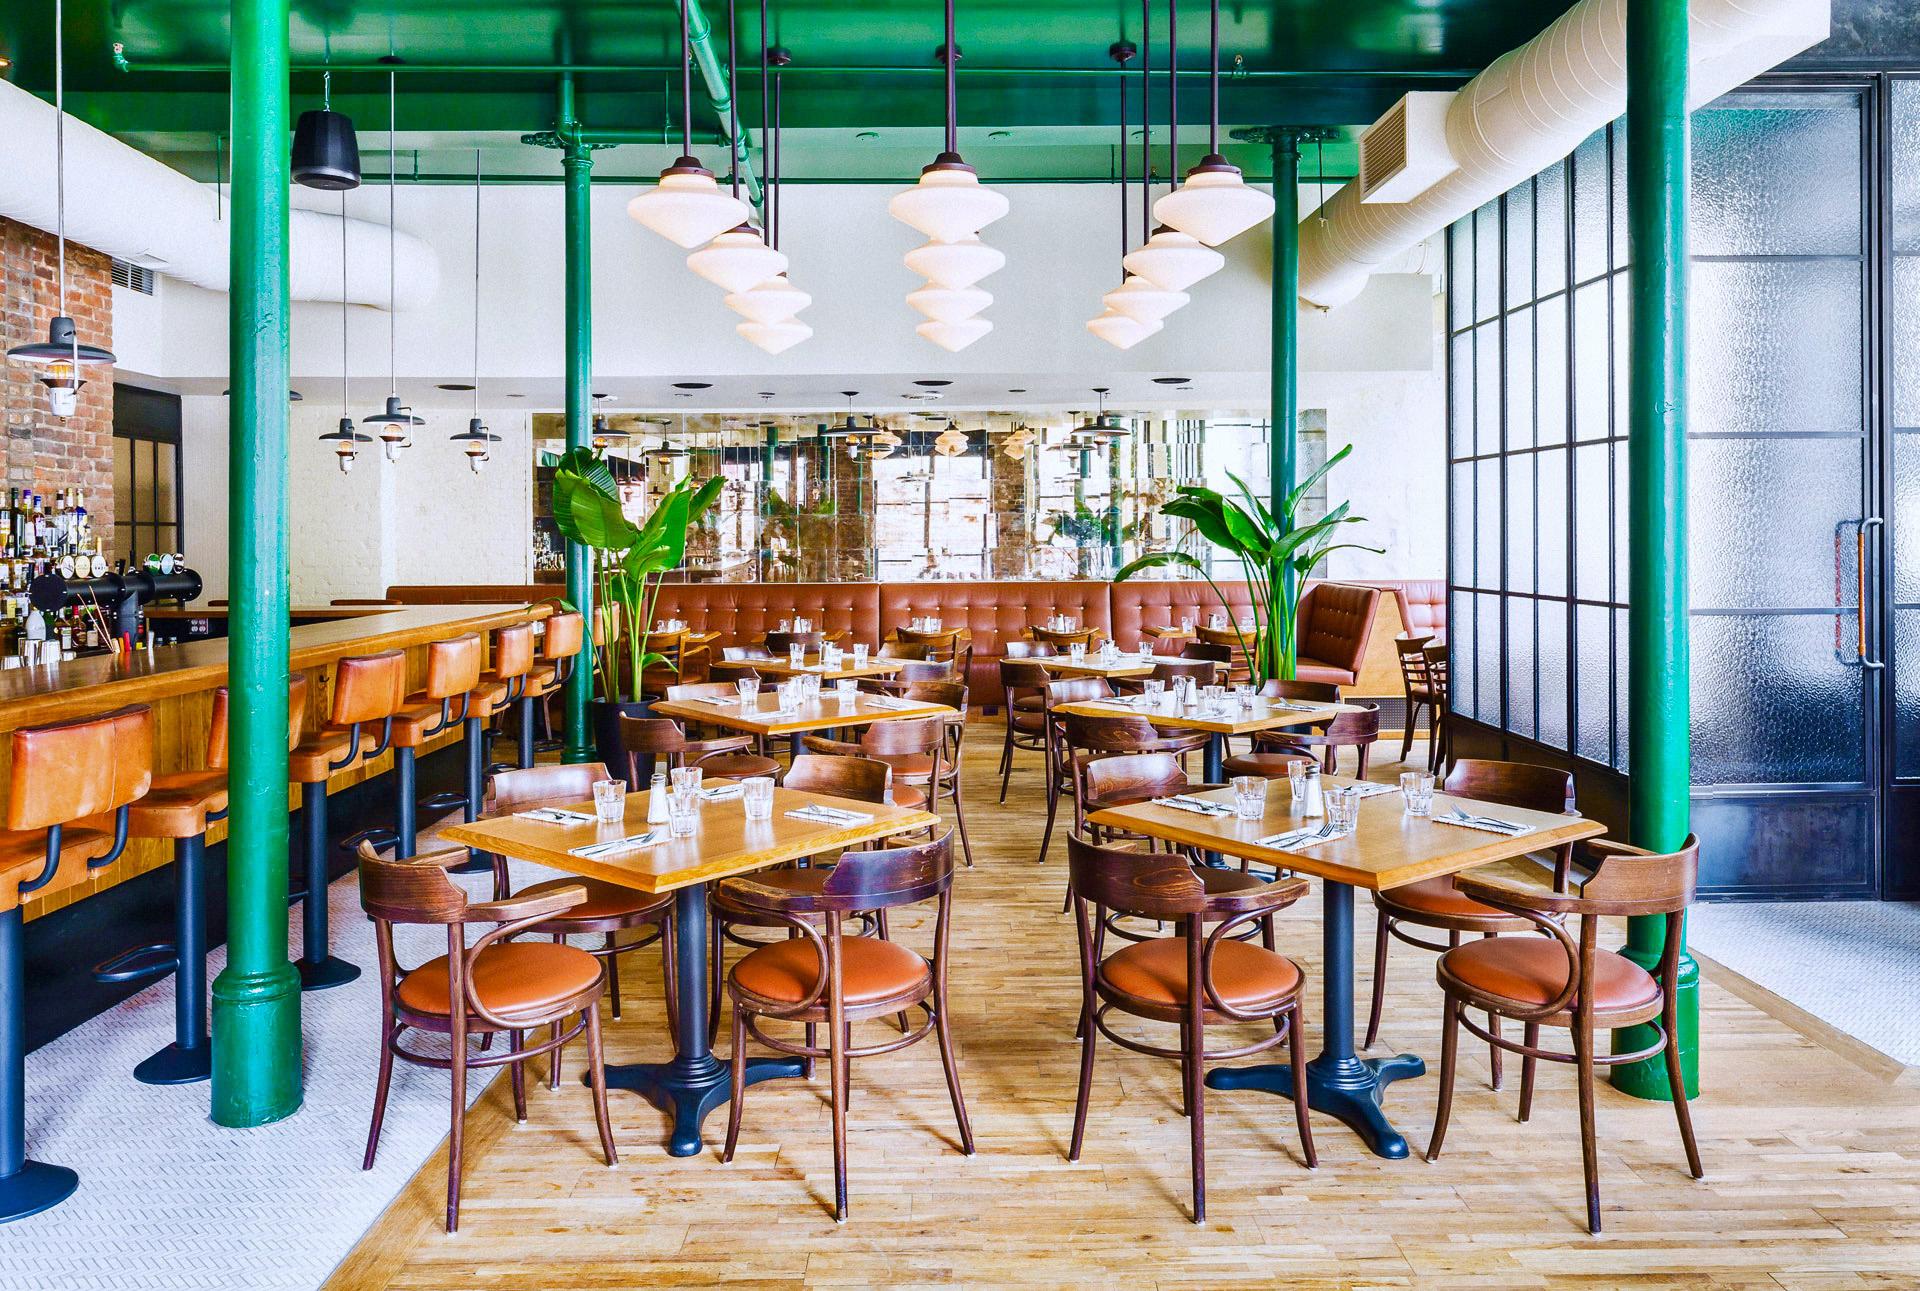 The Best Old Montreal Restaurants - Vallier Bistro for proper Québécois food